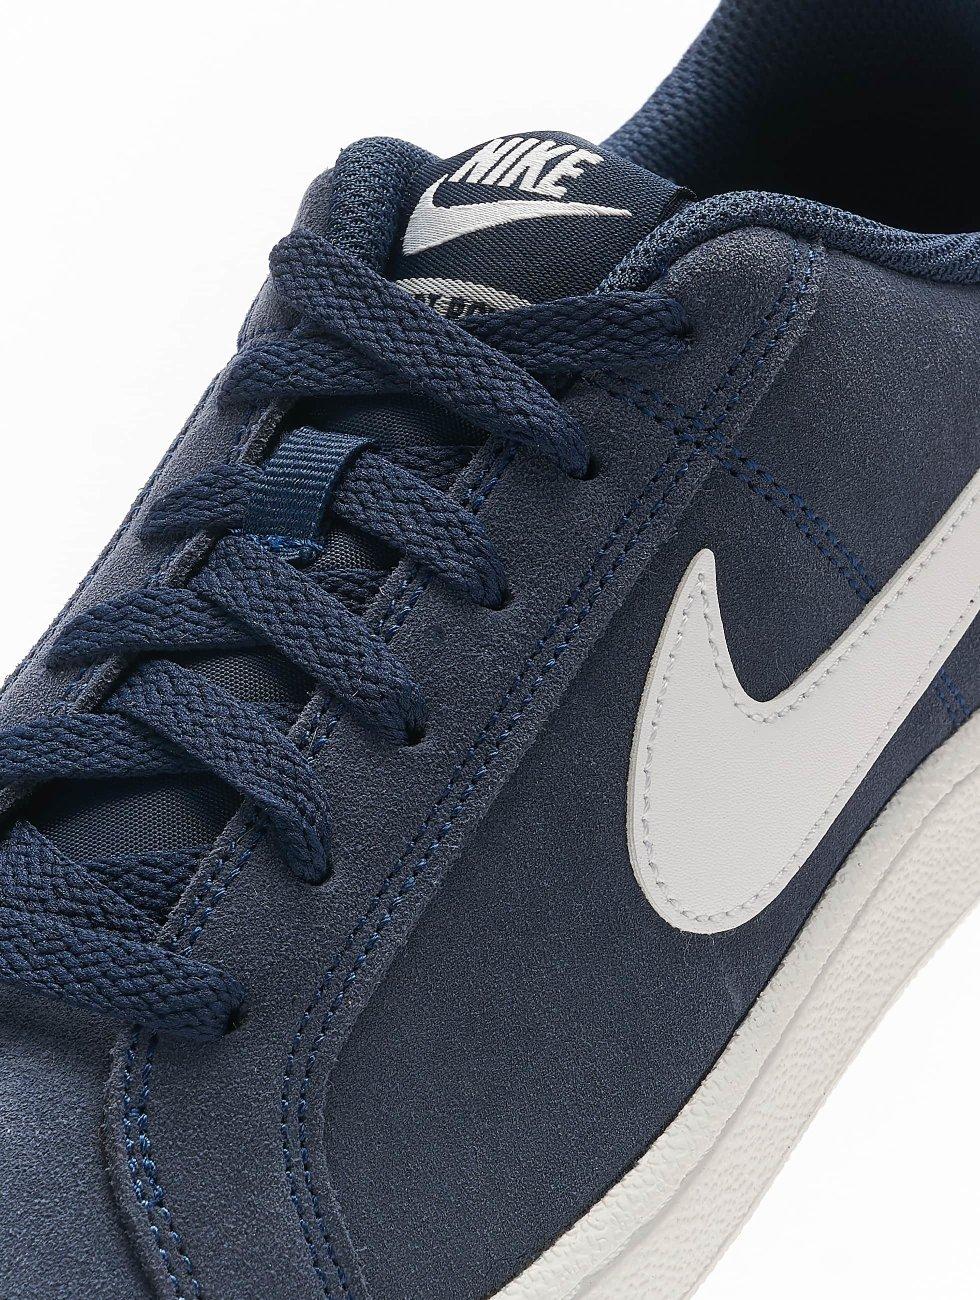 Goedkope Koop Levering Winkelen Uw Eigen Nike schoen / sneaker Court Royale Suede in blauw 422156 MTWCi